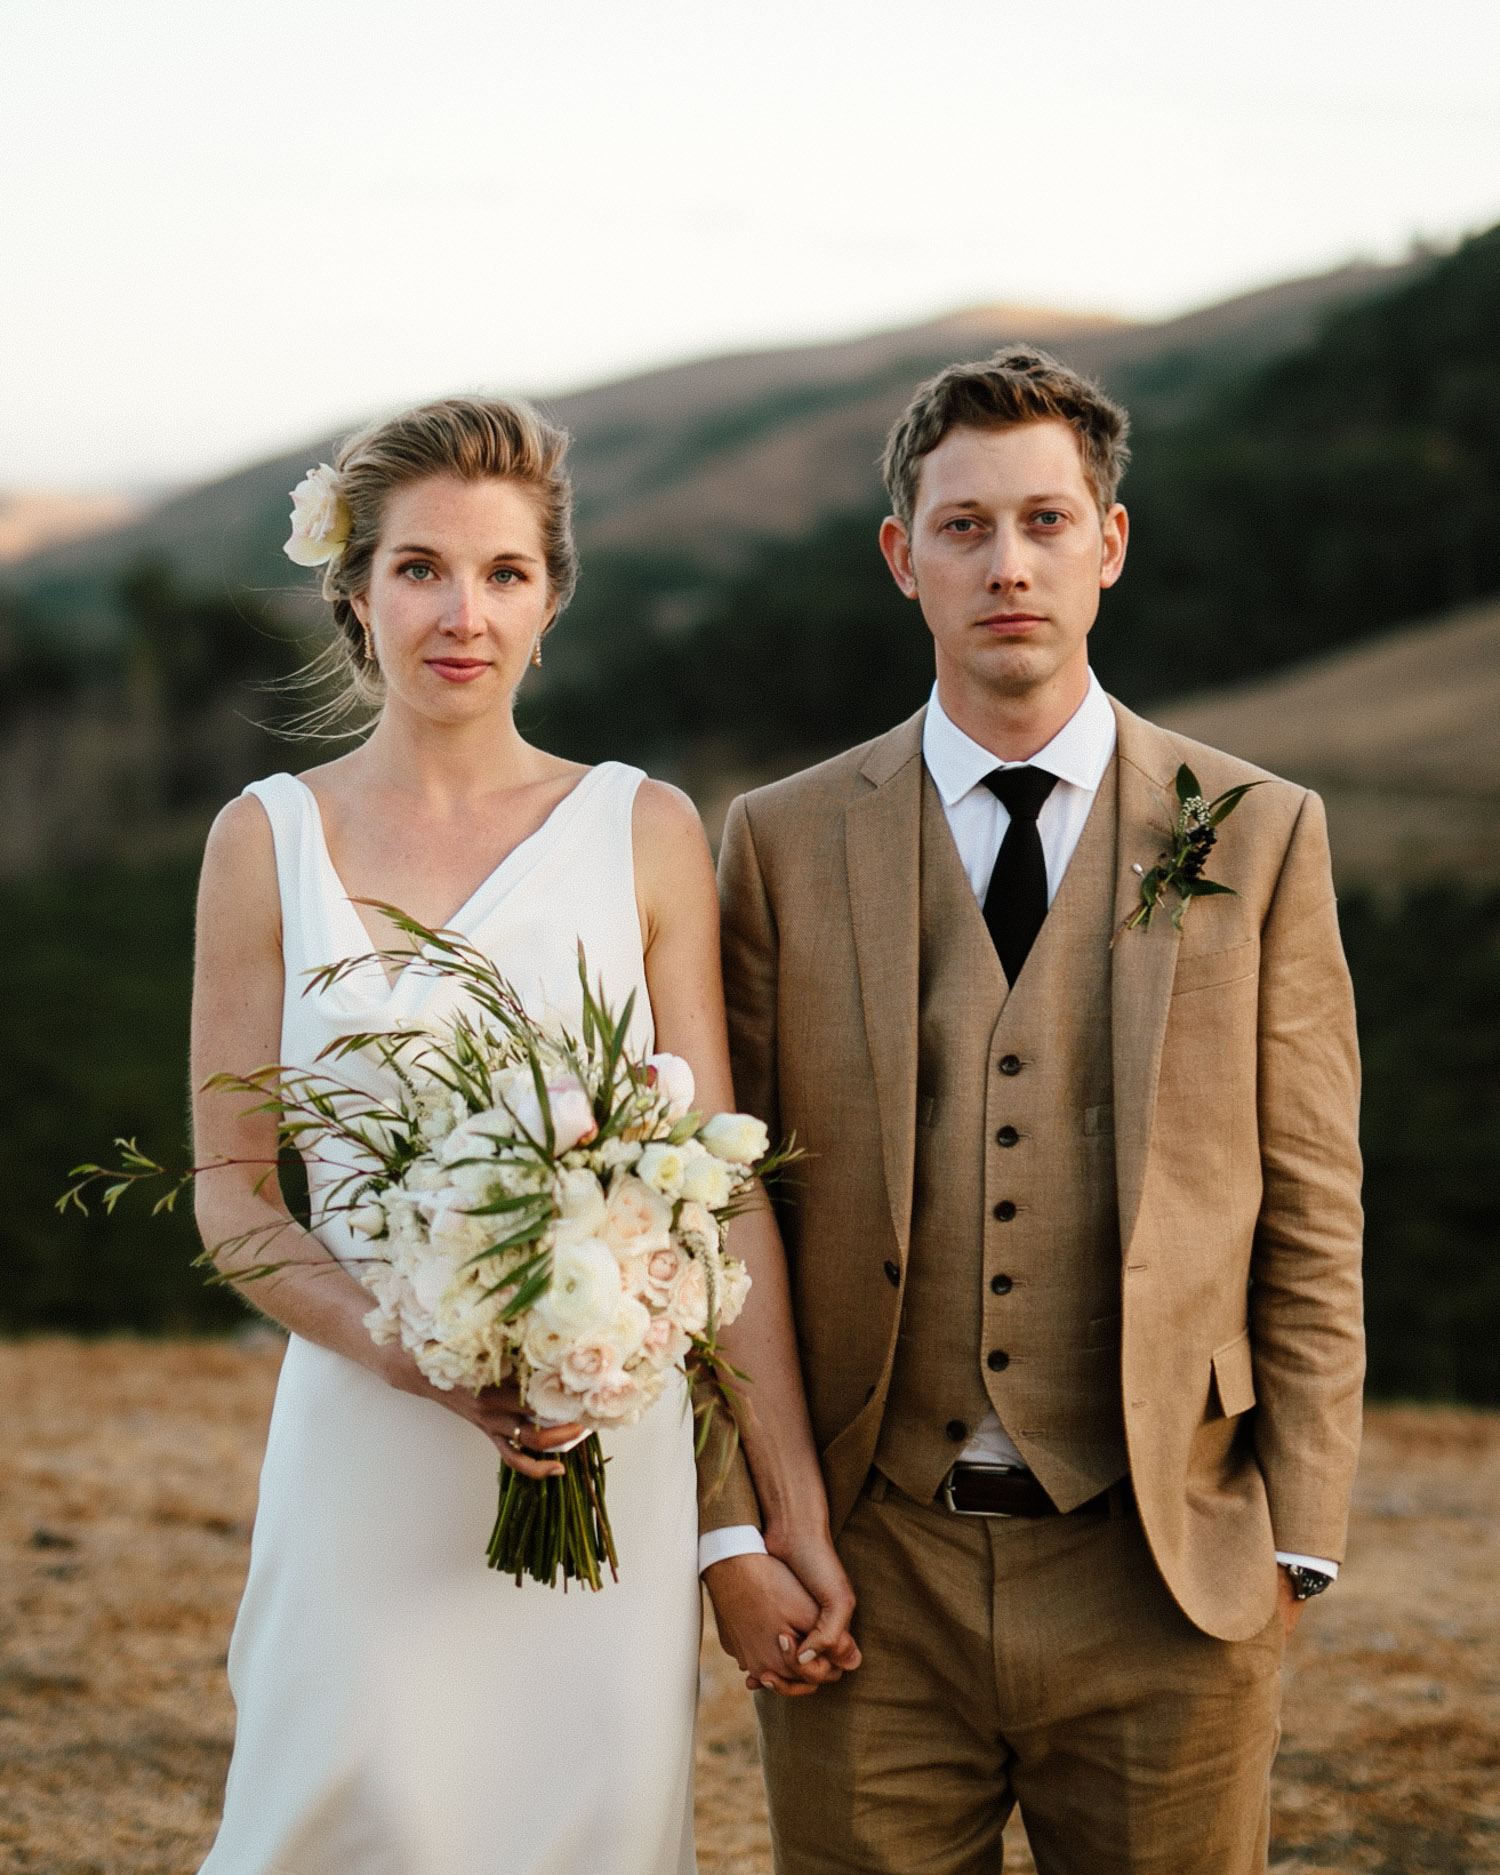 Destination Wedding Photographer, Cayucos, CA  - The Gathering Season x weareleoandkat 089.JPG